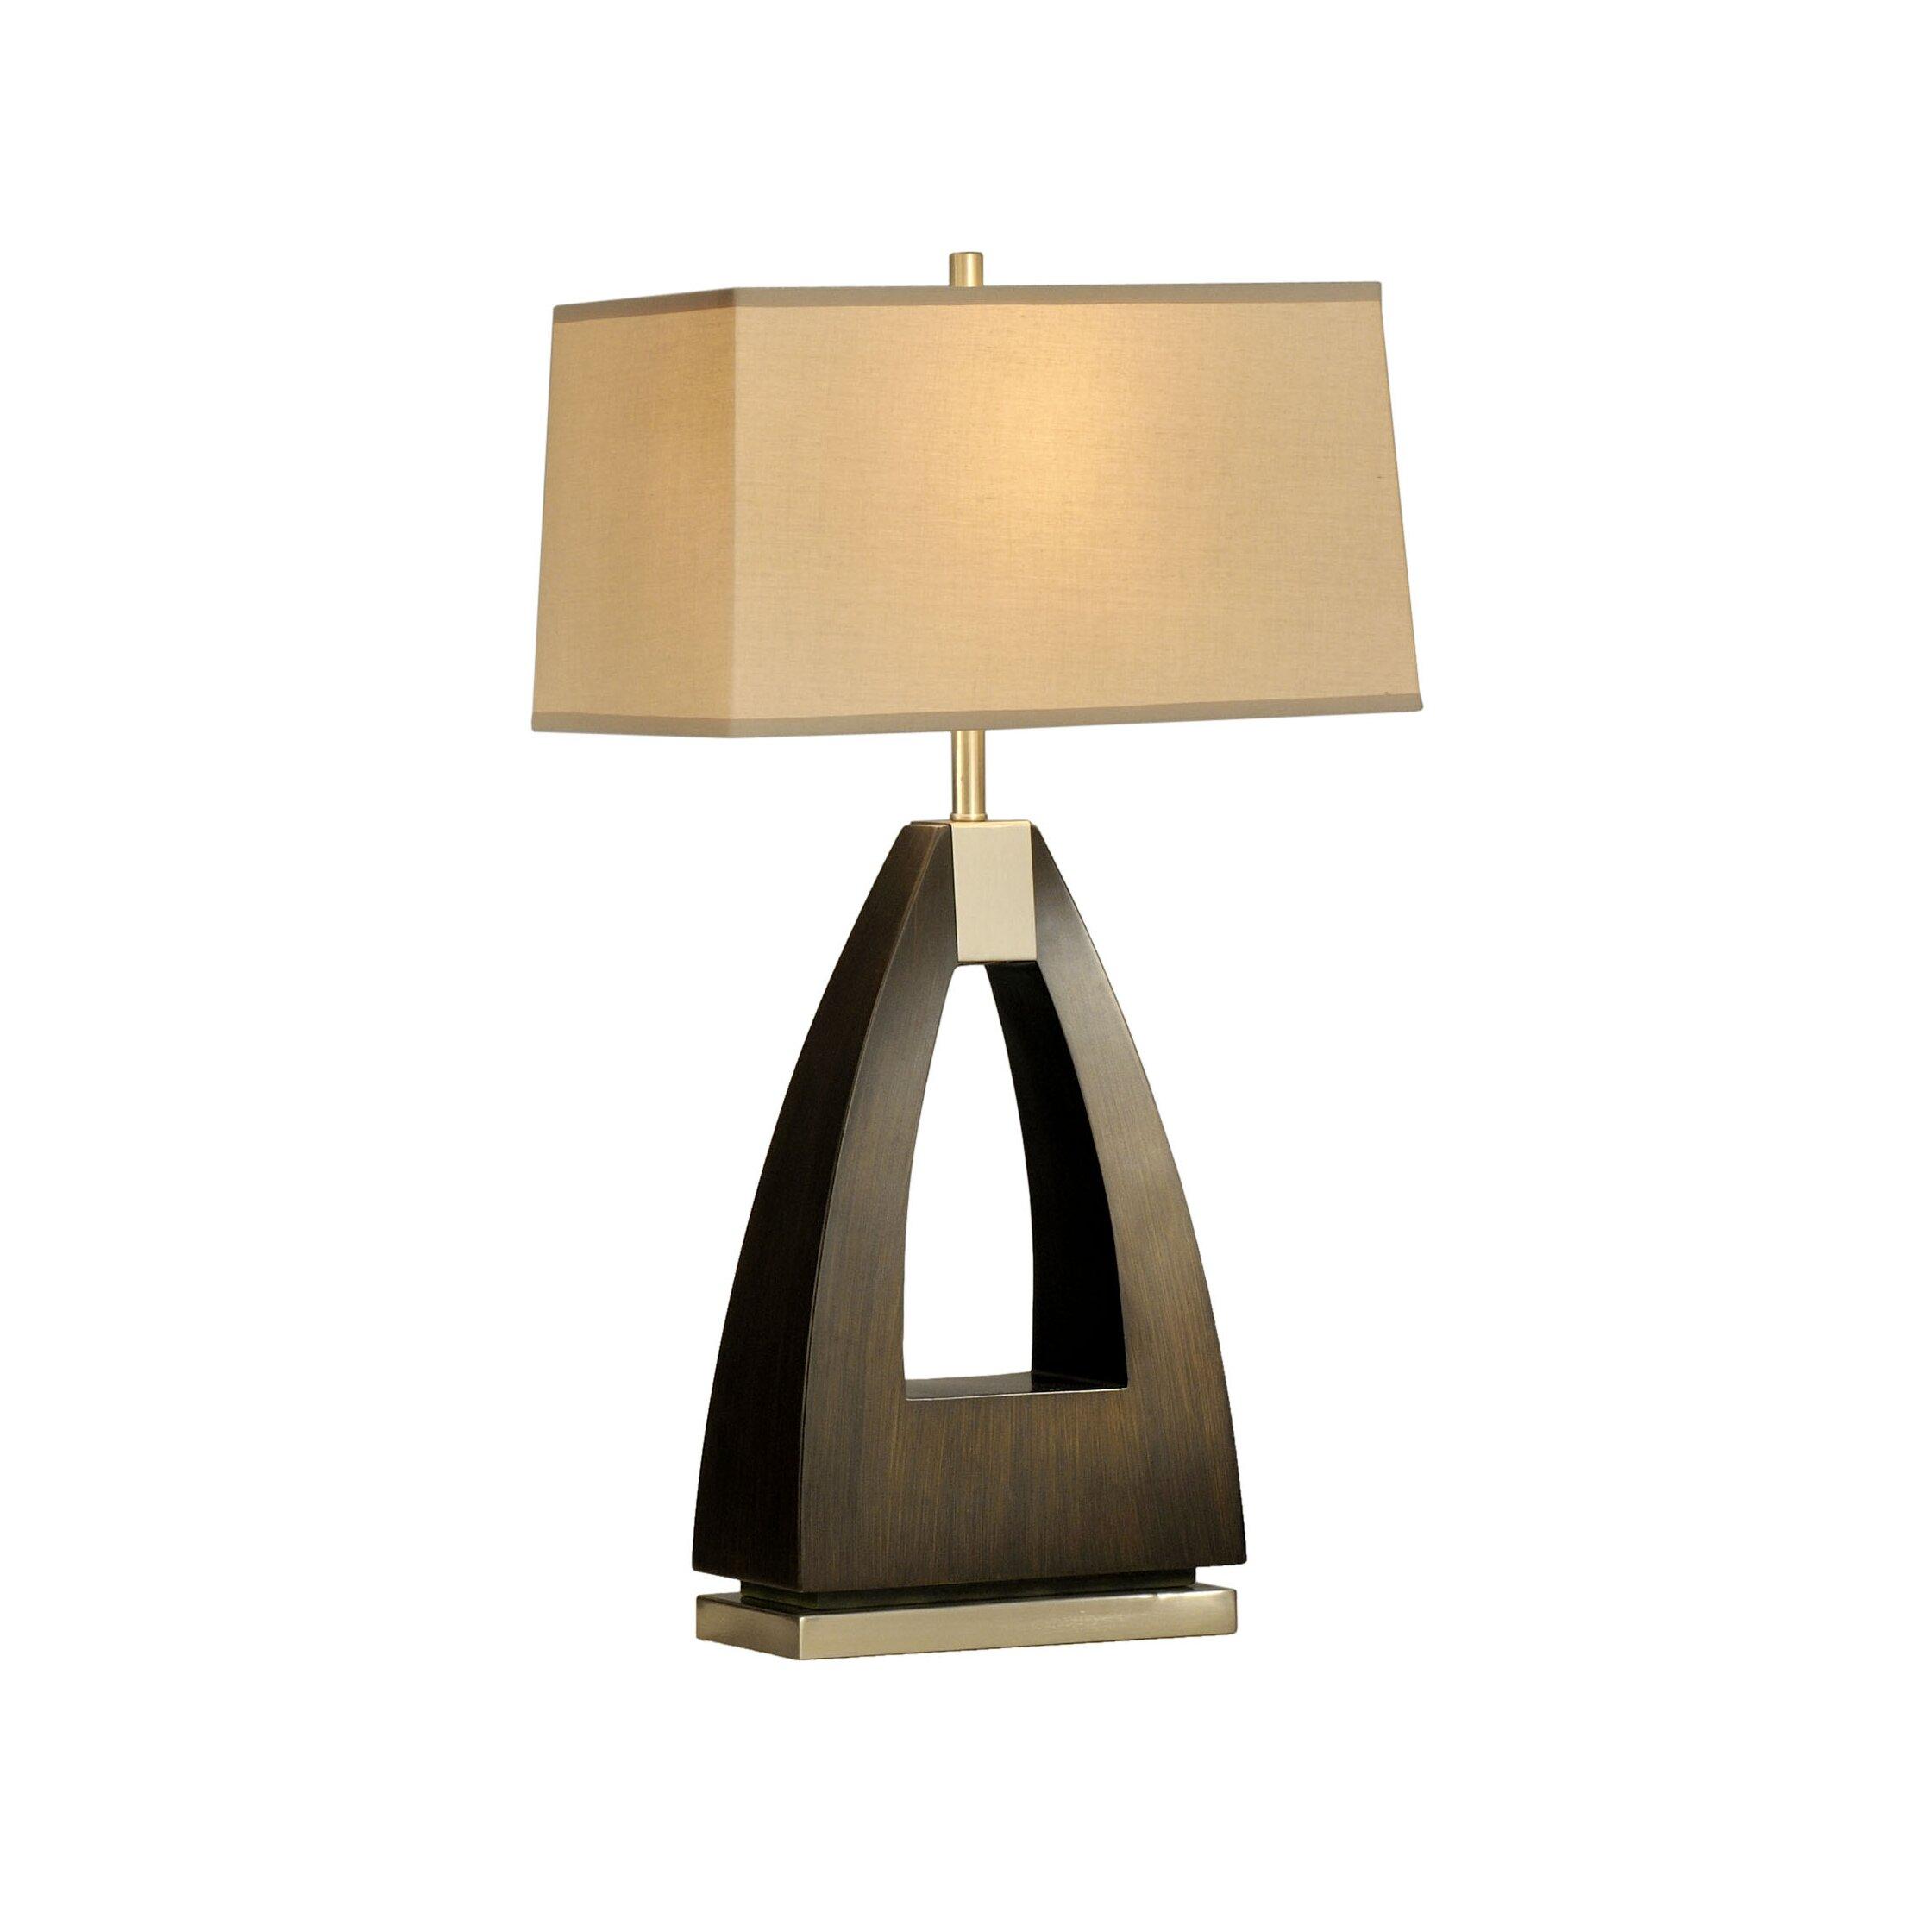 lighting lamps table lamps nova sku nva1285. Black Bedroom Furniture Sets. Home Design Ideas